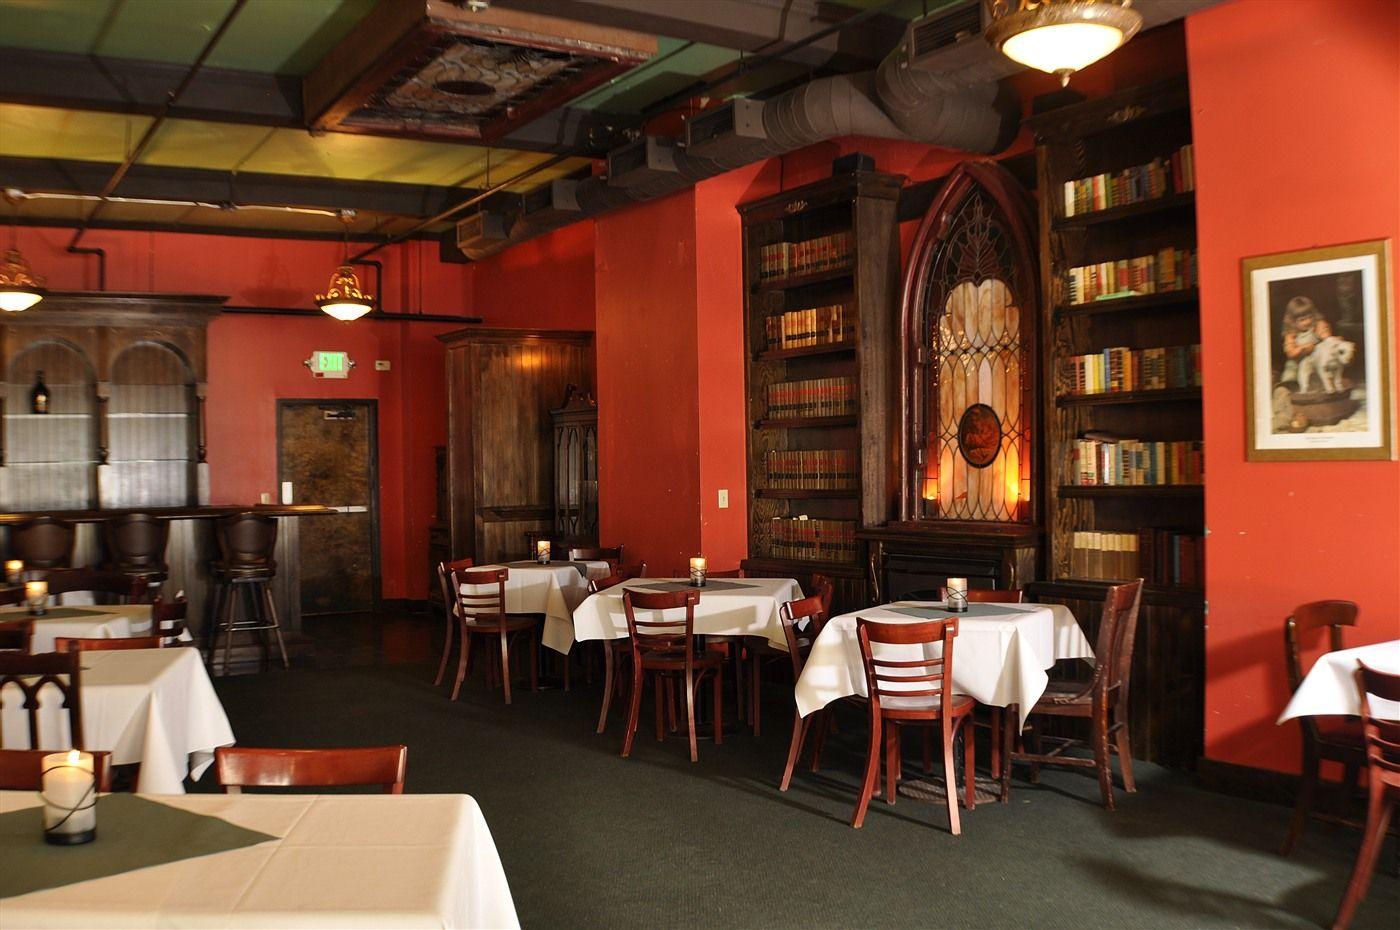 Mo S Irish Pub Banquet Menu Available Private Rooms